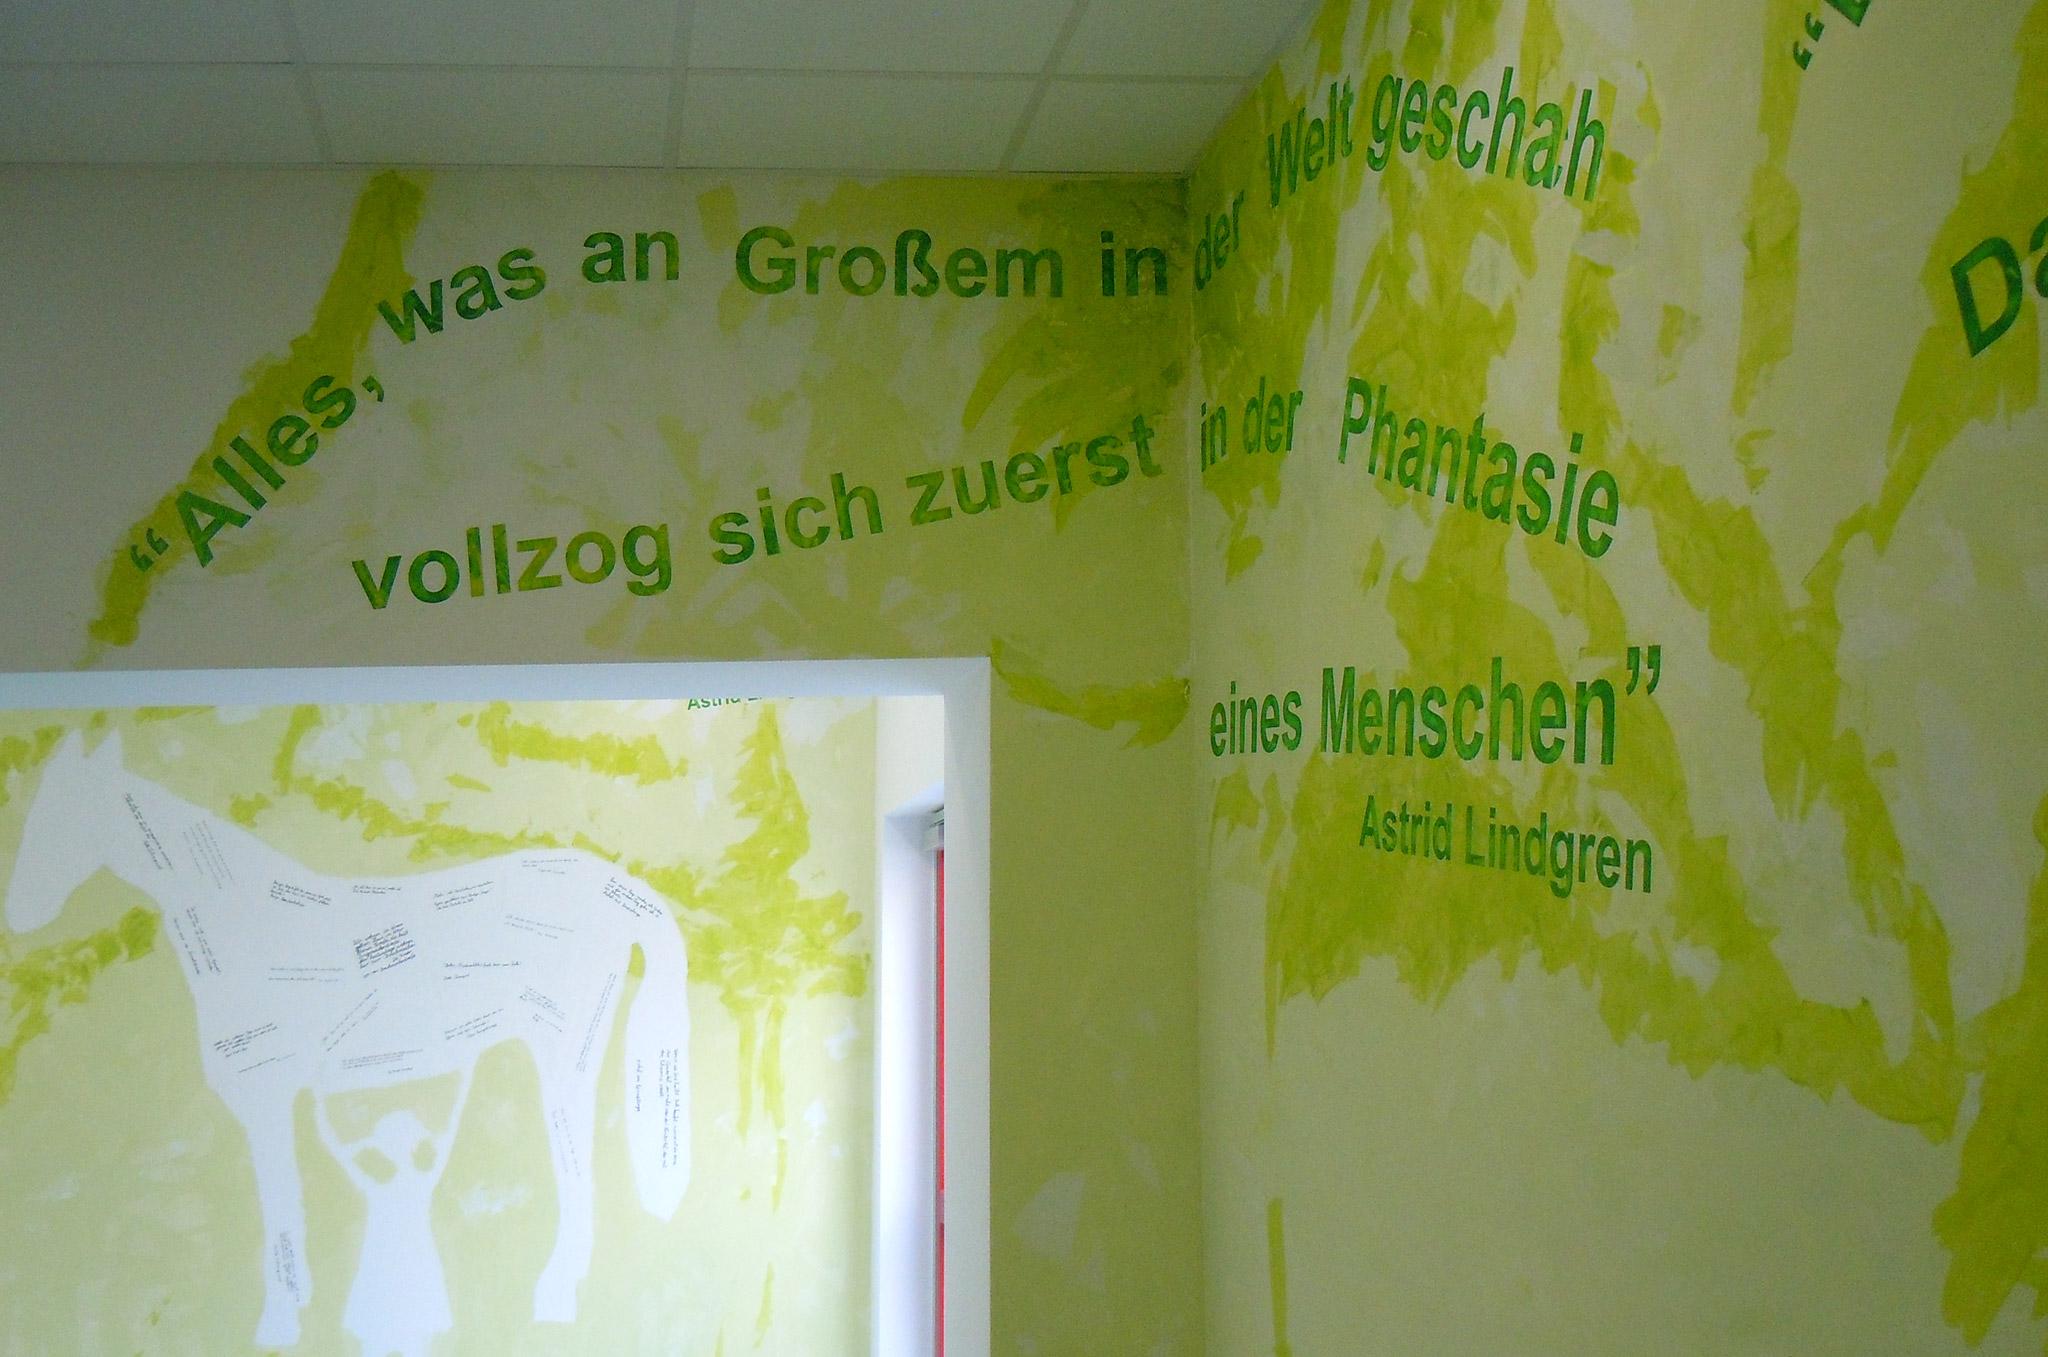 Hommage an astrid lindgren kunst am bau tanja corbach for Raumgestaltung partizipation